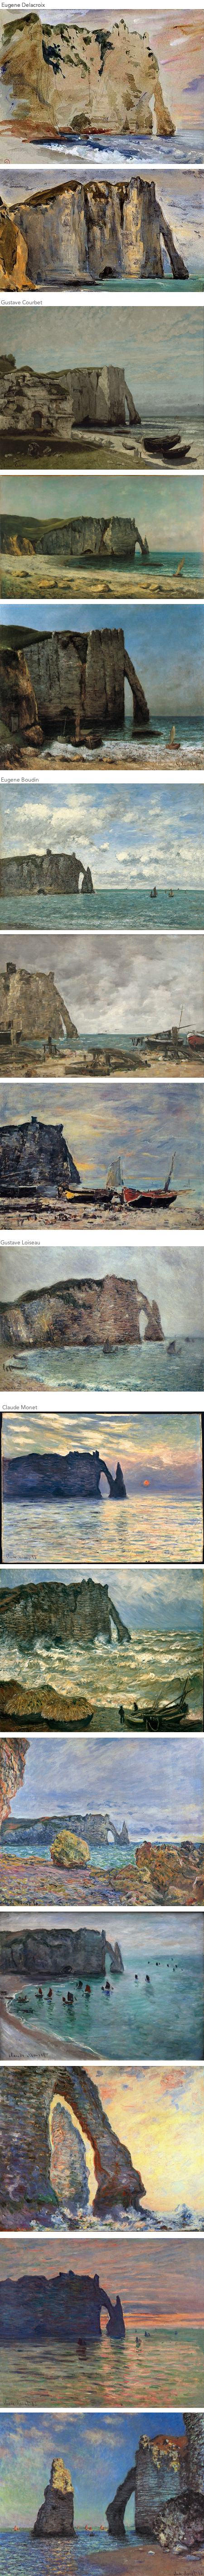 Cliffs of Etretat Eugene Delacroix, Gustave Courbet, Eugene Boudin, ustave Loiseau, Claude Monet